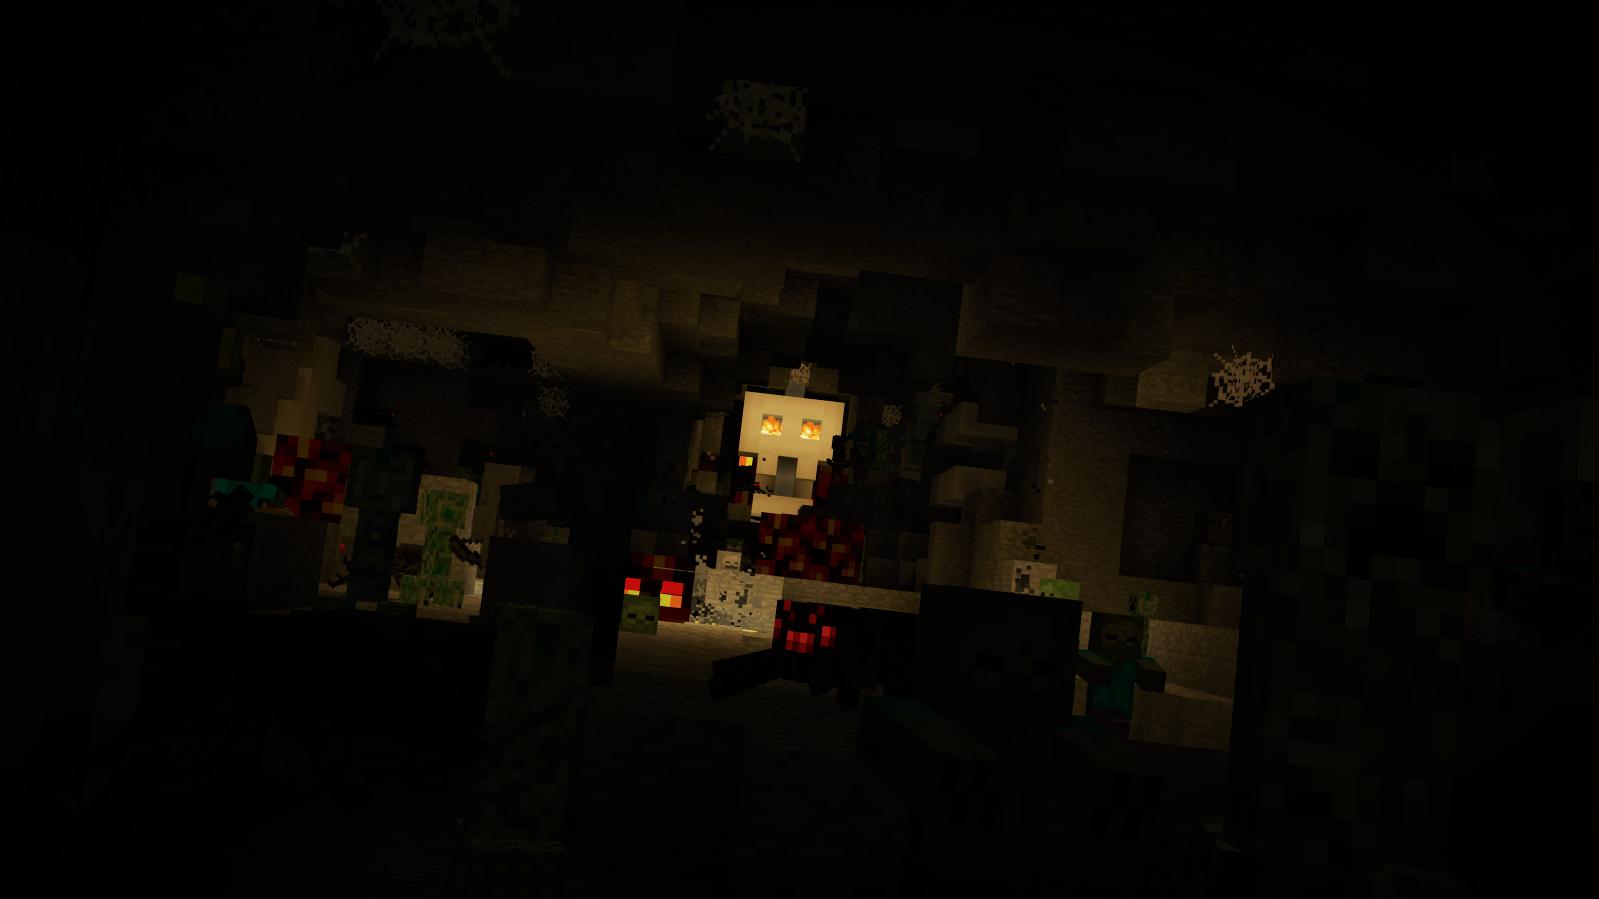 Minecraft Dantdm Horror Games - Micro USB k